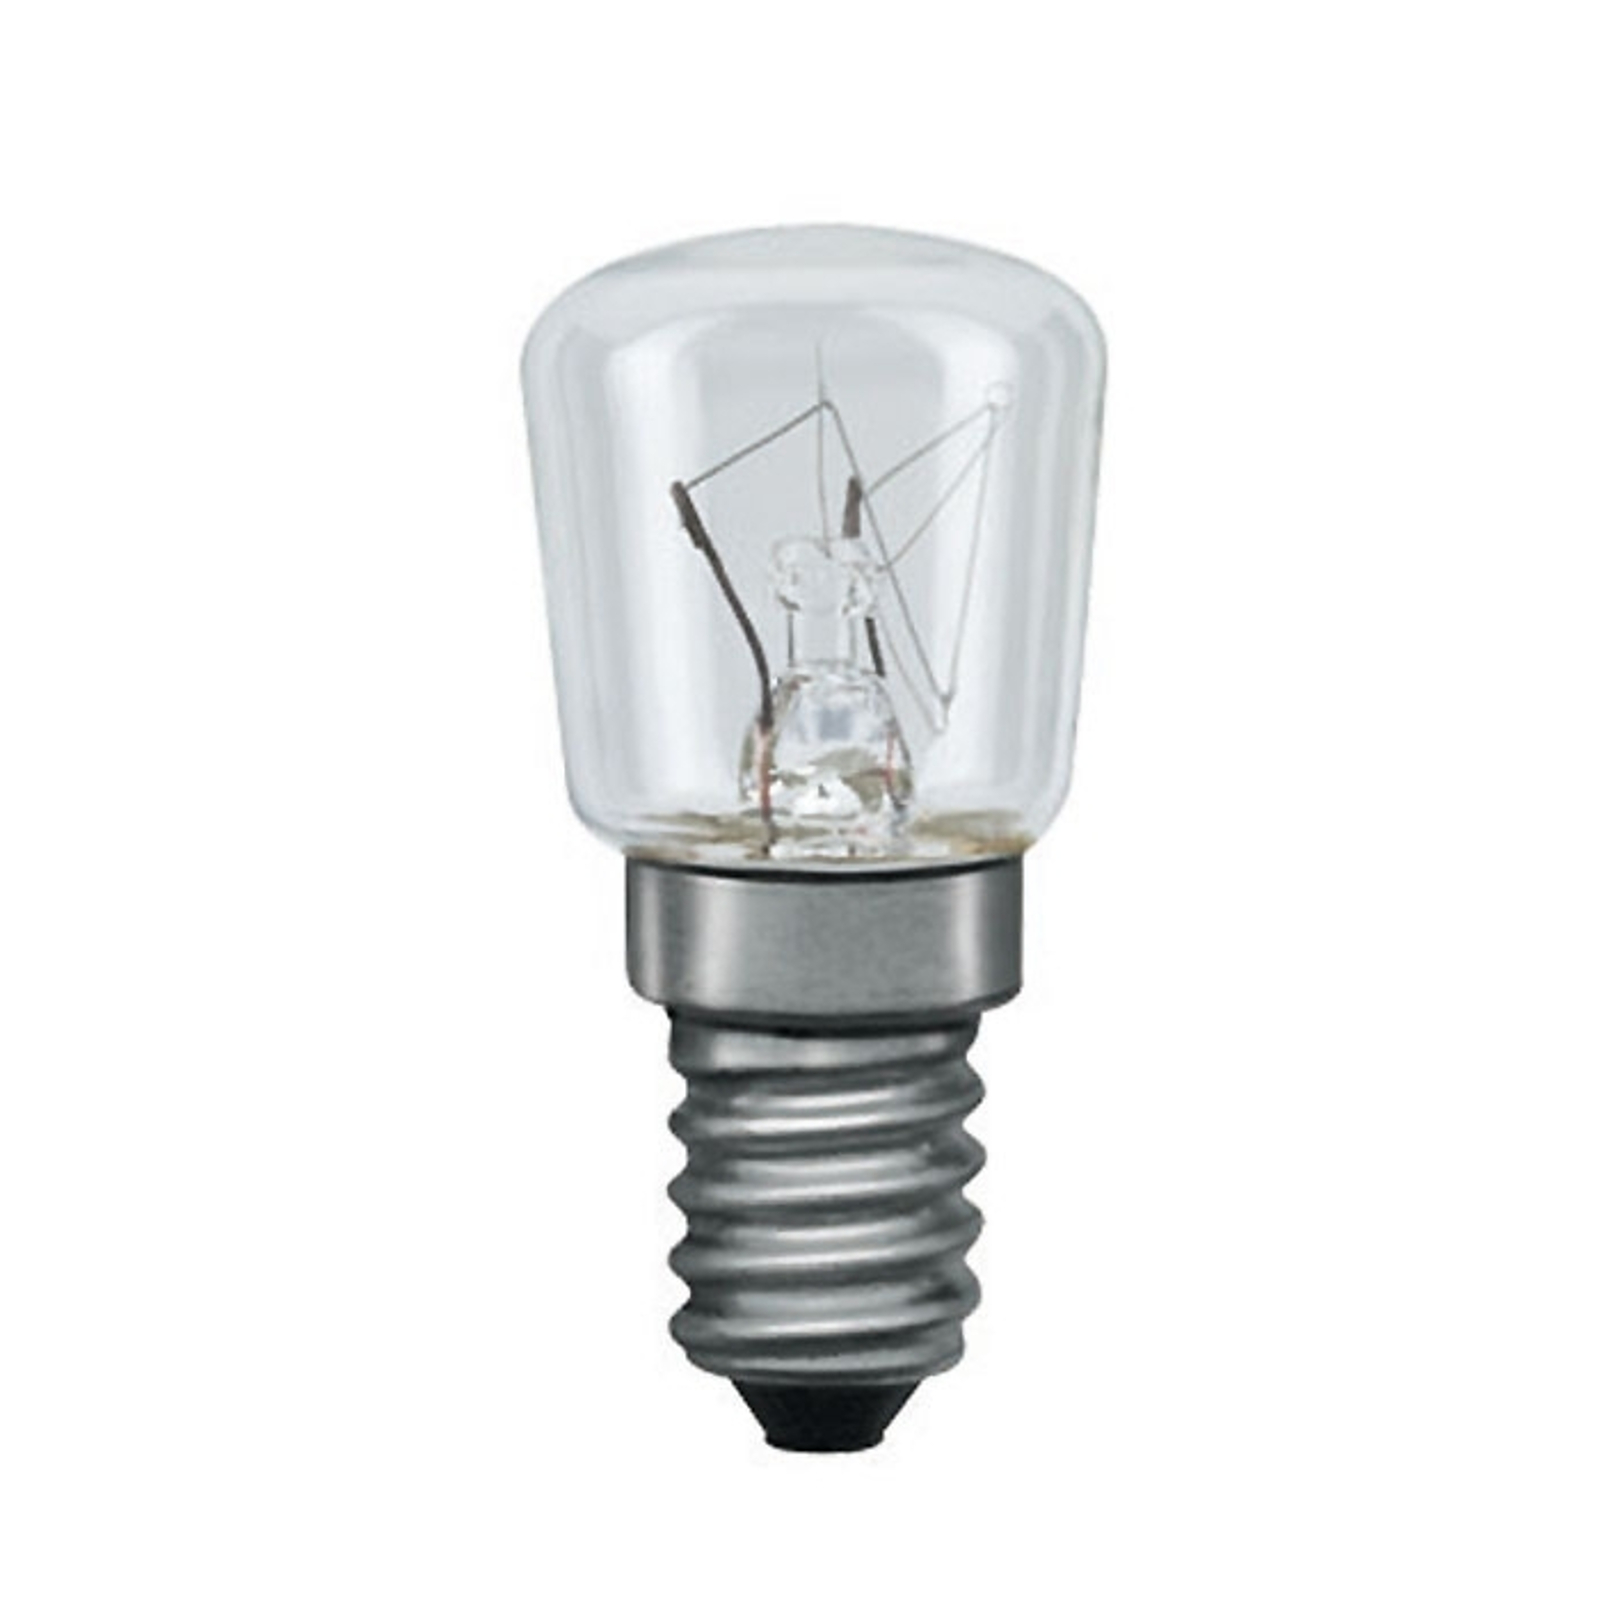 E14 7W pæreformet lyskilde til sengelamper